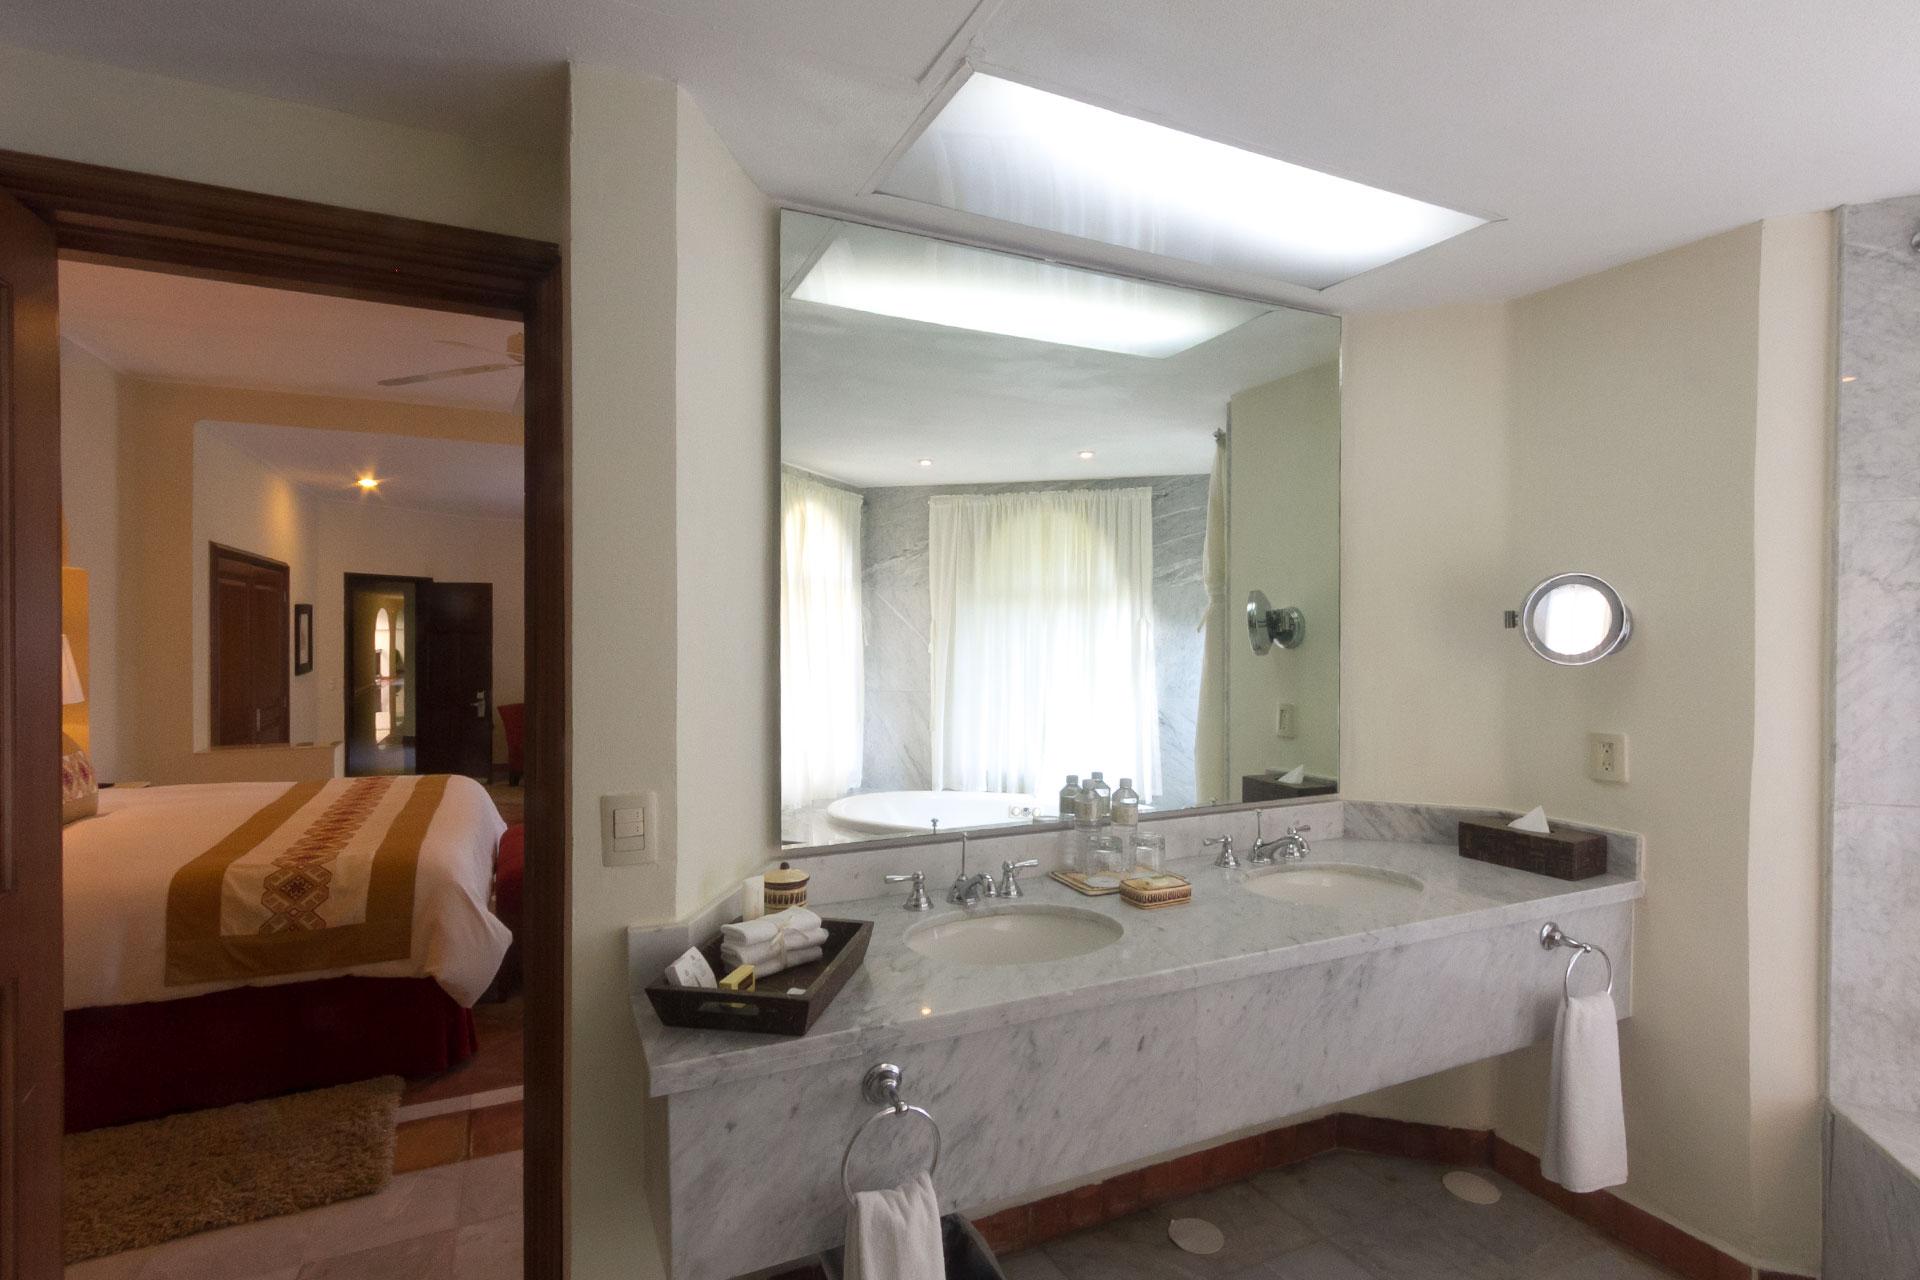 Casa velas master suite plus 2 different world for Case con 2 master suite